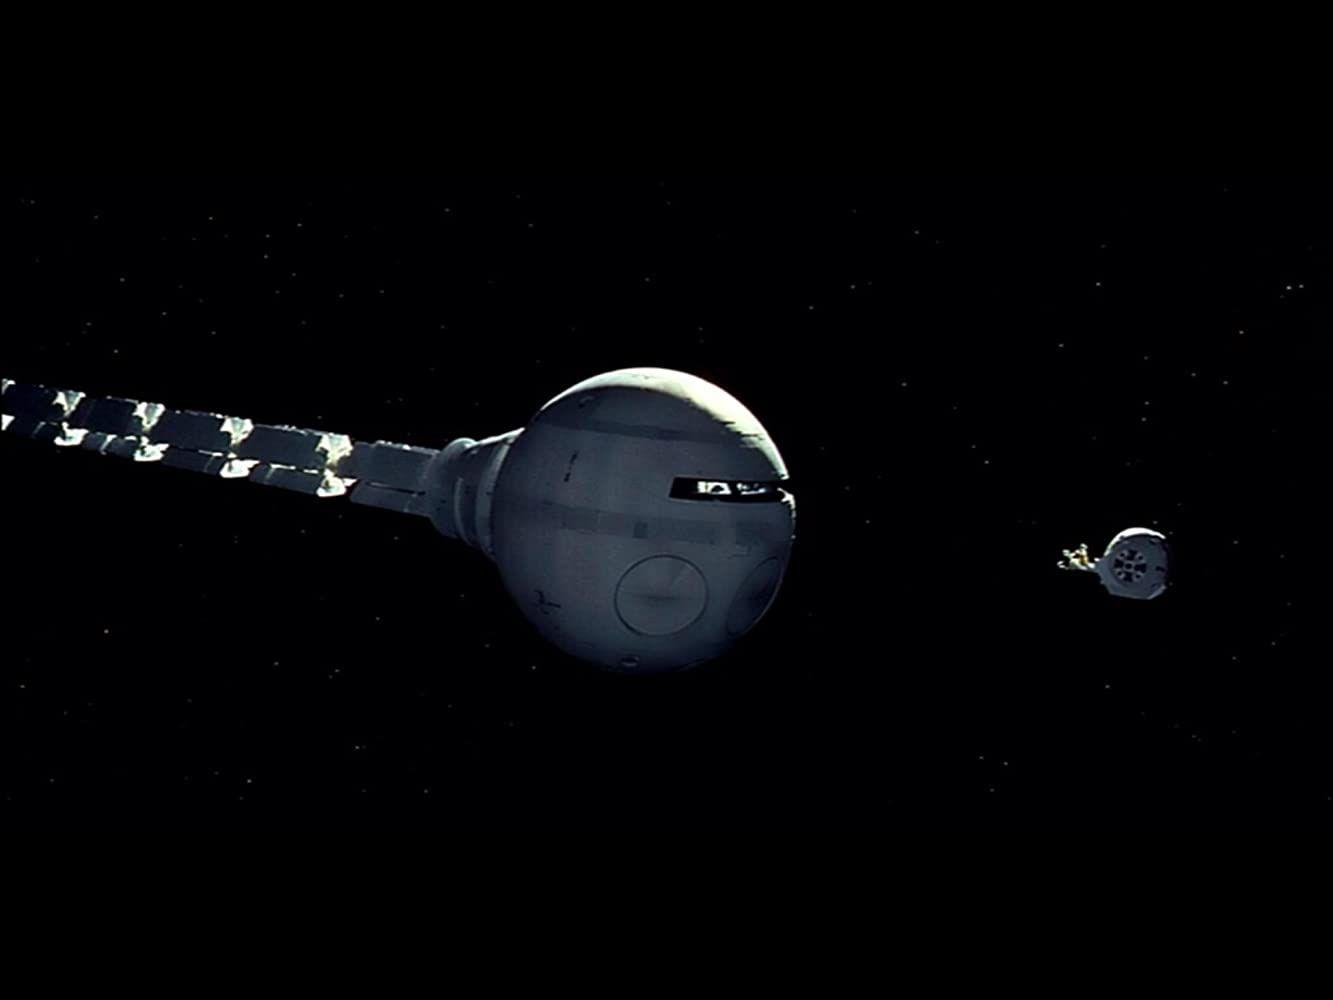 2001 Odissea Nello Spazio 1968 Space Odyssey Odyssey 2001 A Space Odyssey